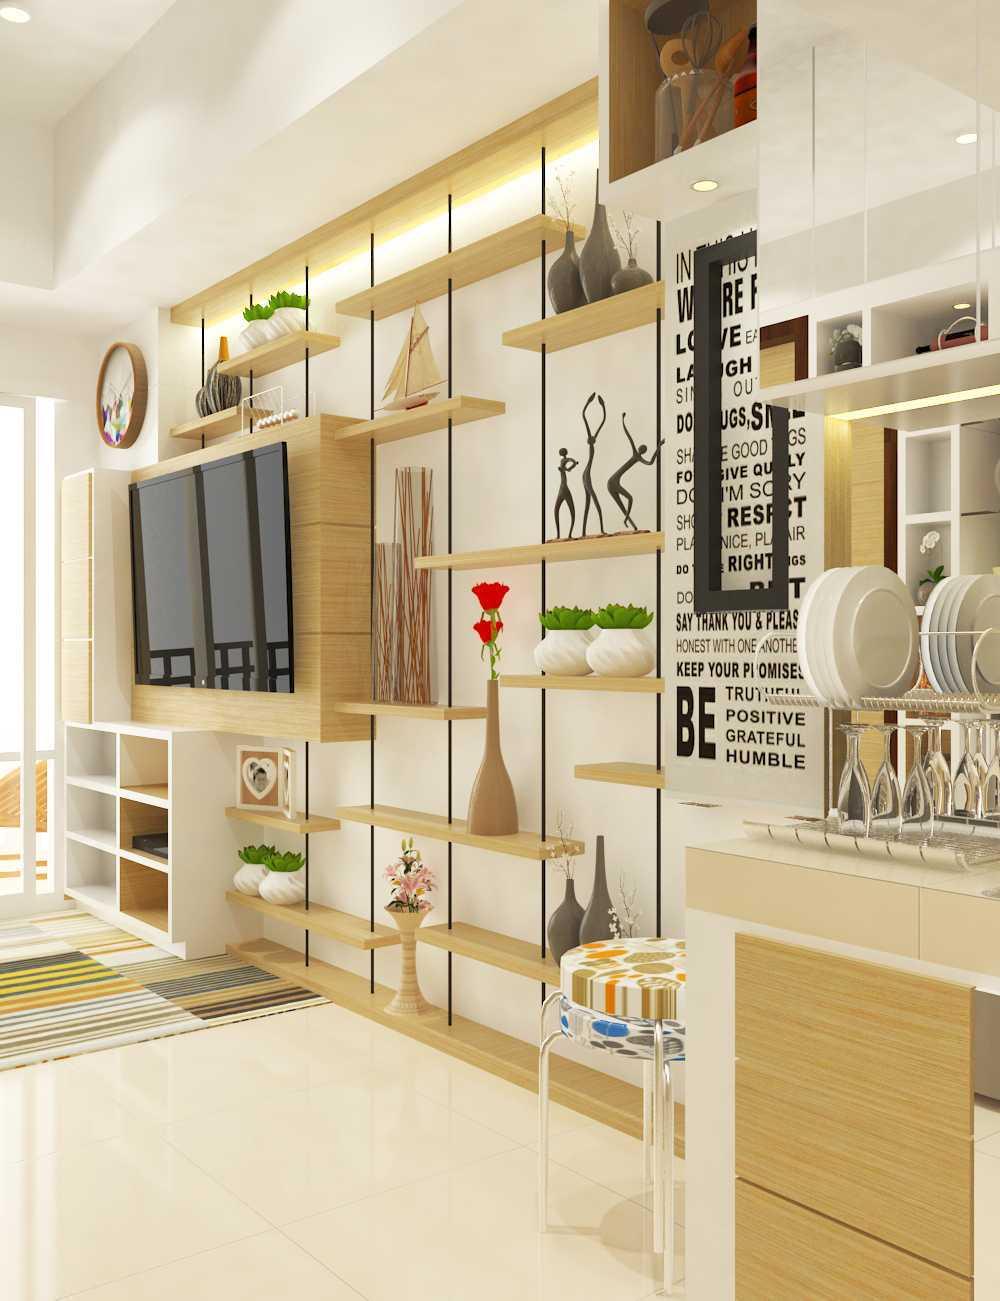 Miv Architects (Ar. Muhammad Ikhsan Hamiru, Iai & Partners) Interior Design Of Apartment Unit Makassar, South Sulawesi, Indonesia Makassar, South Sulawesi, Indonesia Apartment Room Design Kontemporer  29127